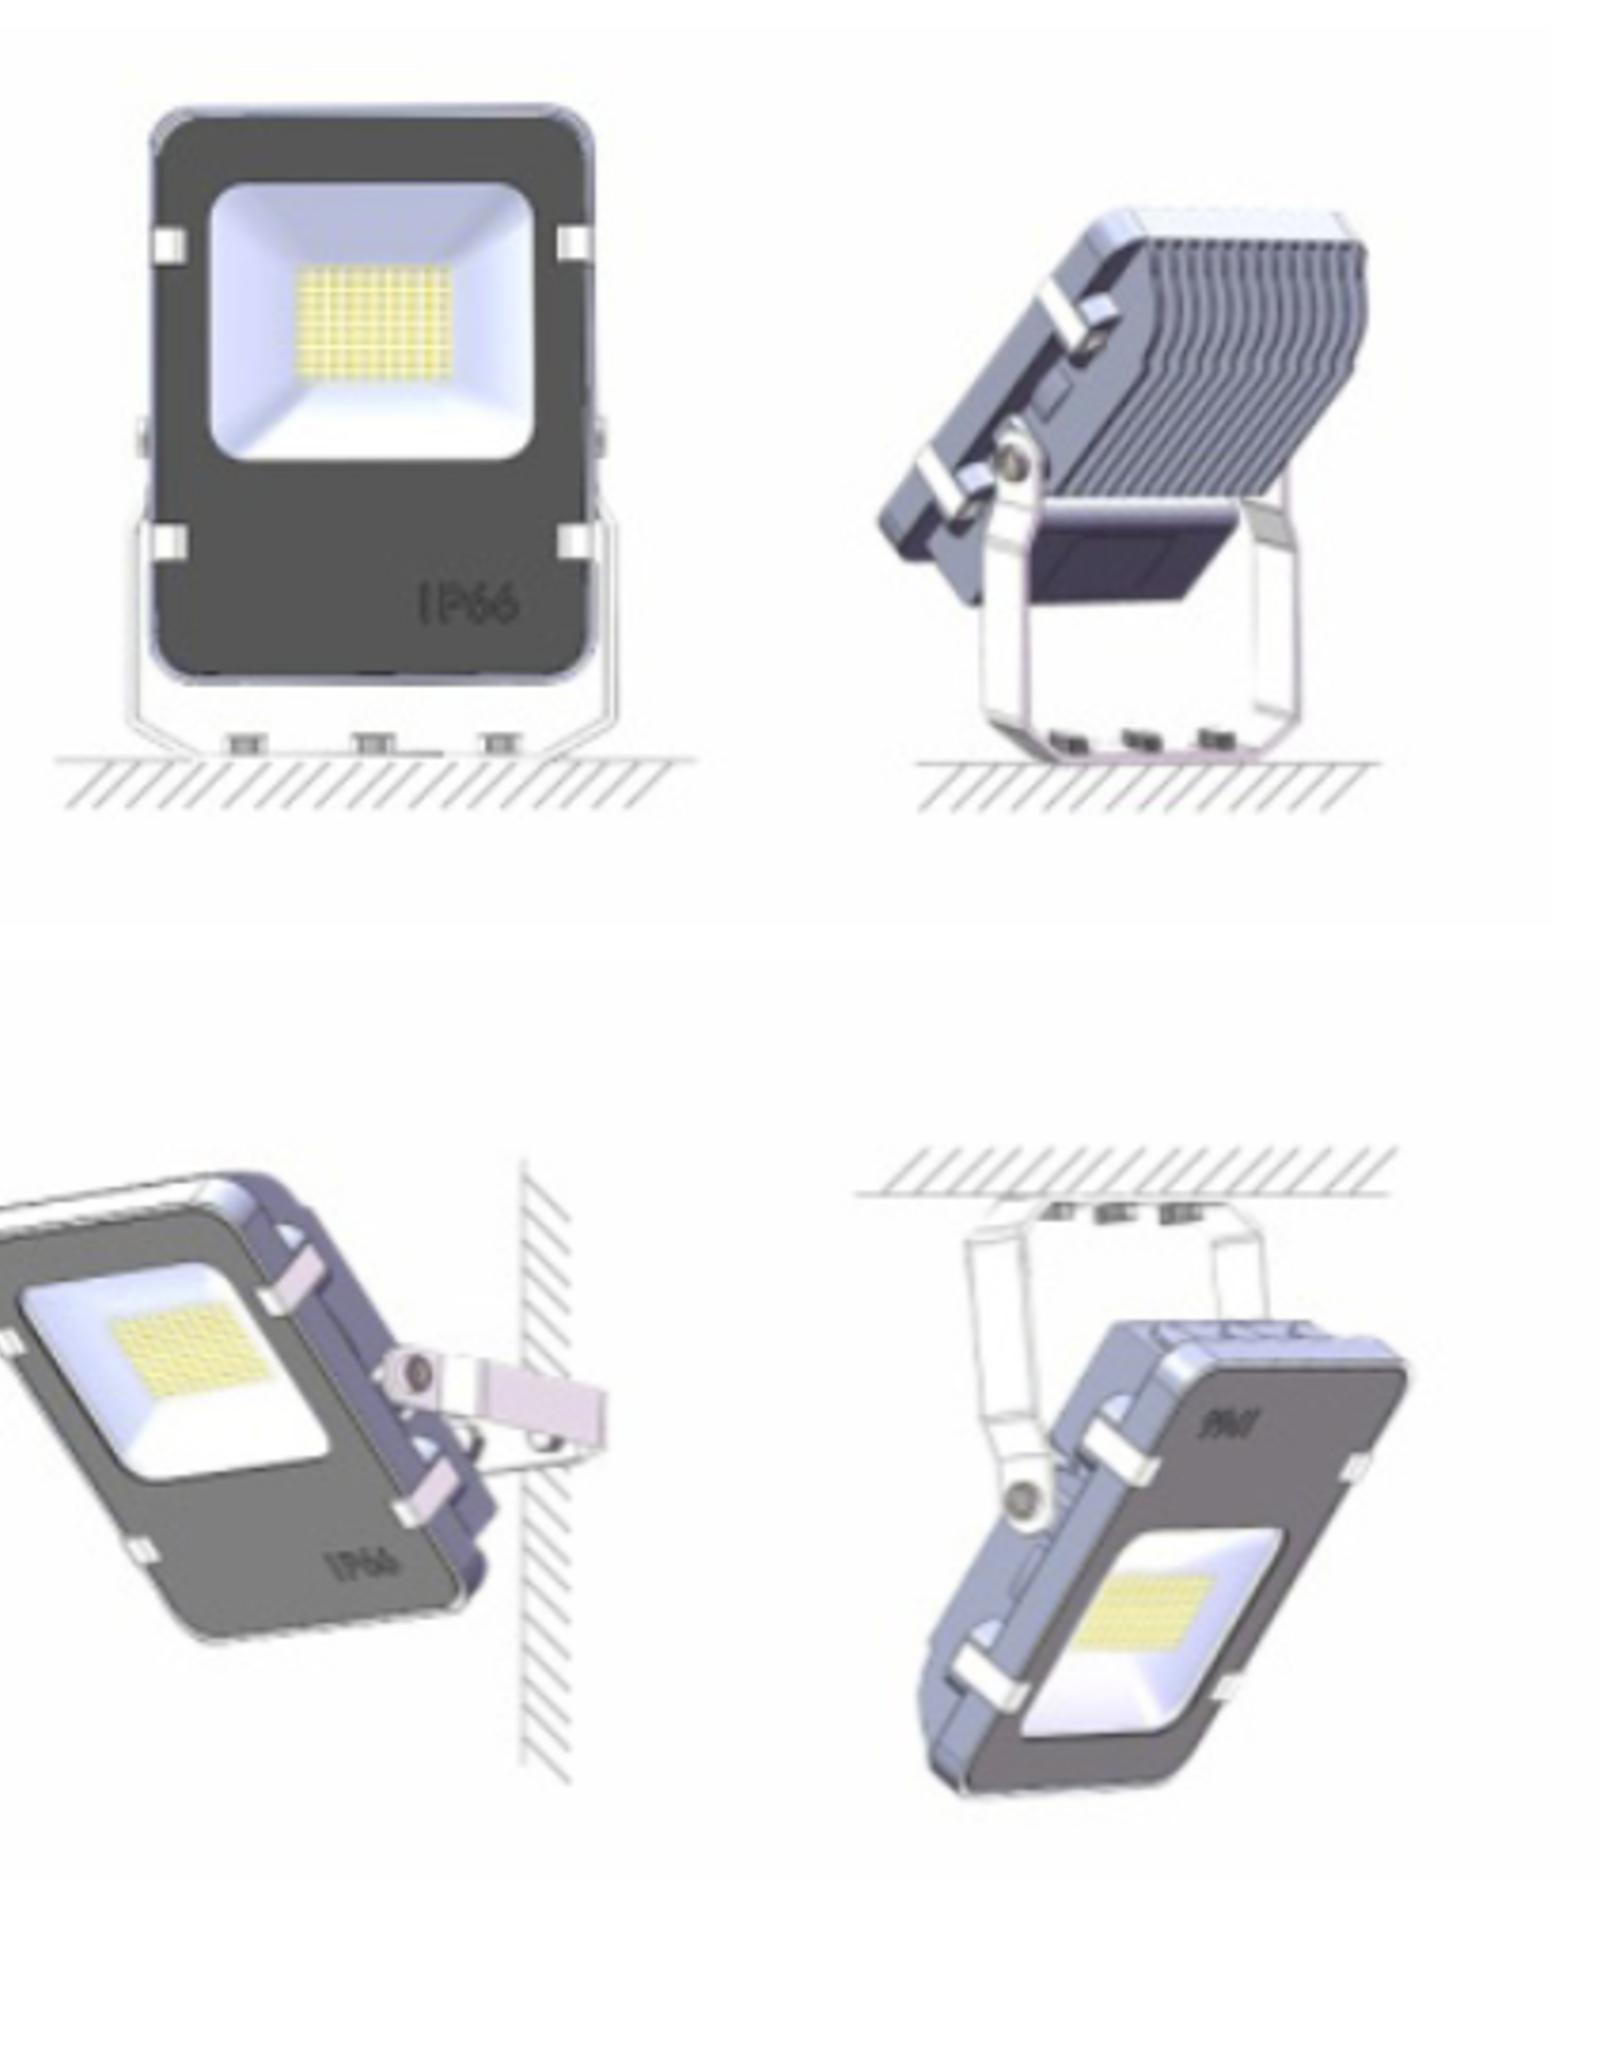 LedLed LED Swelo Schijnwerper IP66 48W